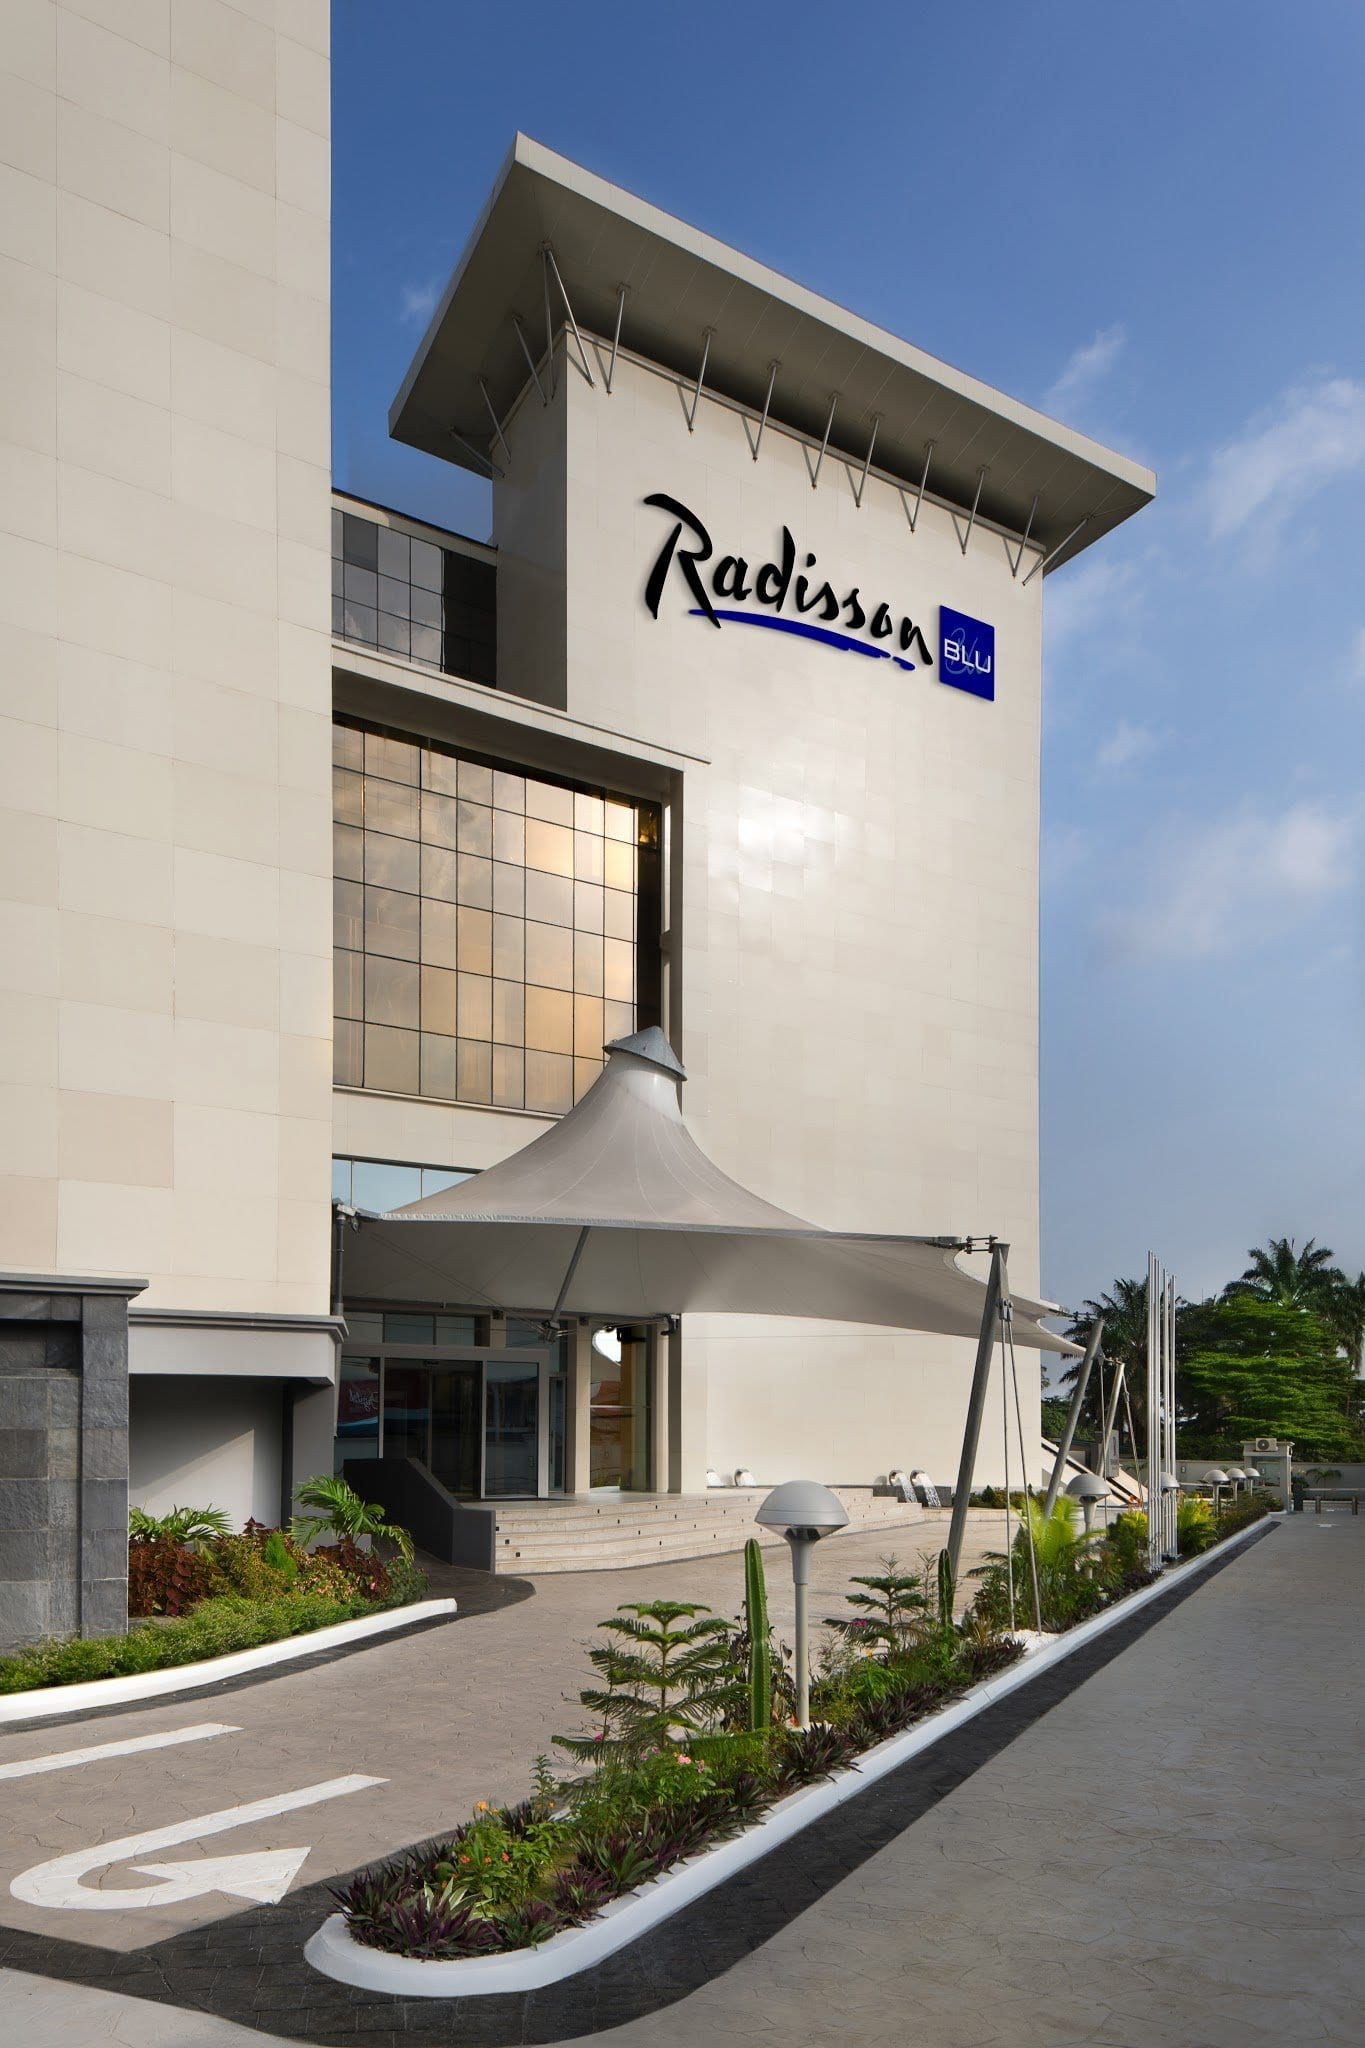 Radisson Blu - Best Rooftop Bars in Lagos Nigeria